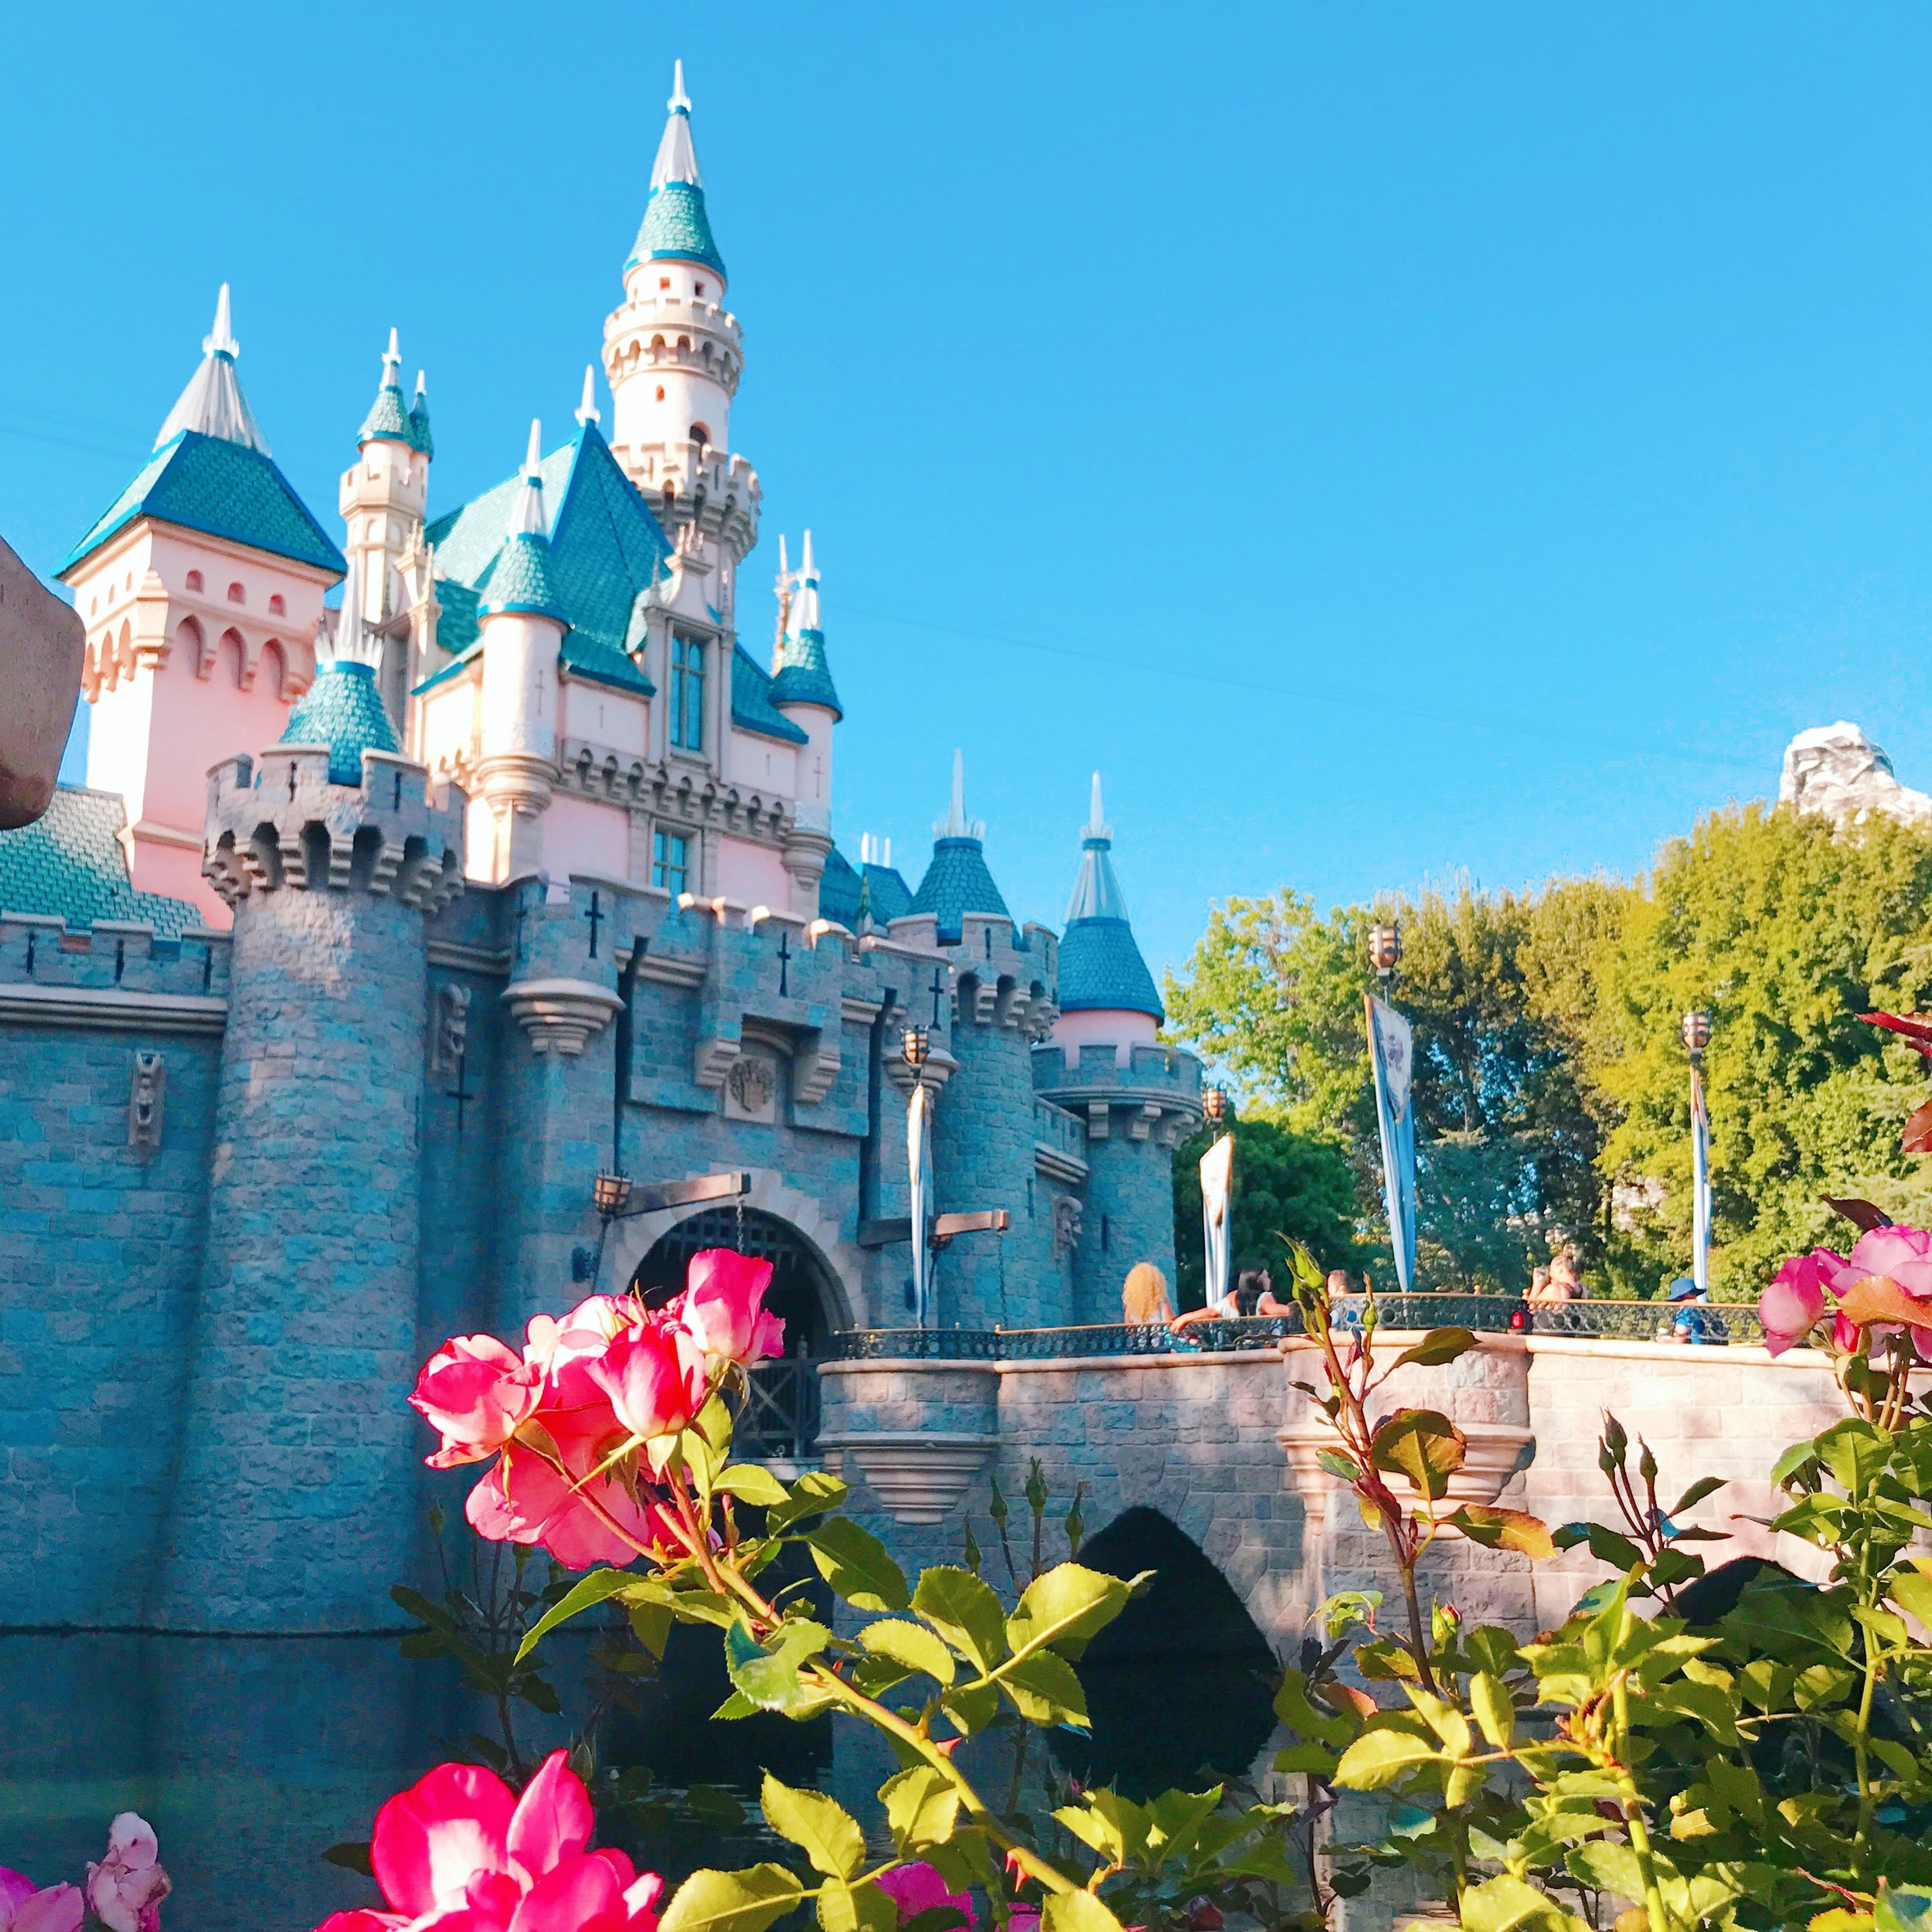 Disneyland_Sleeping_Beauty_Castle.jpg